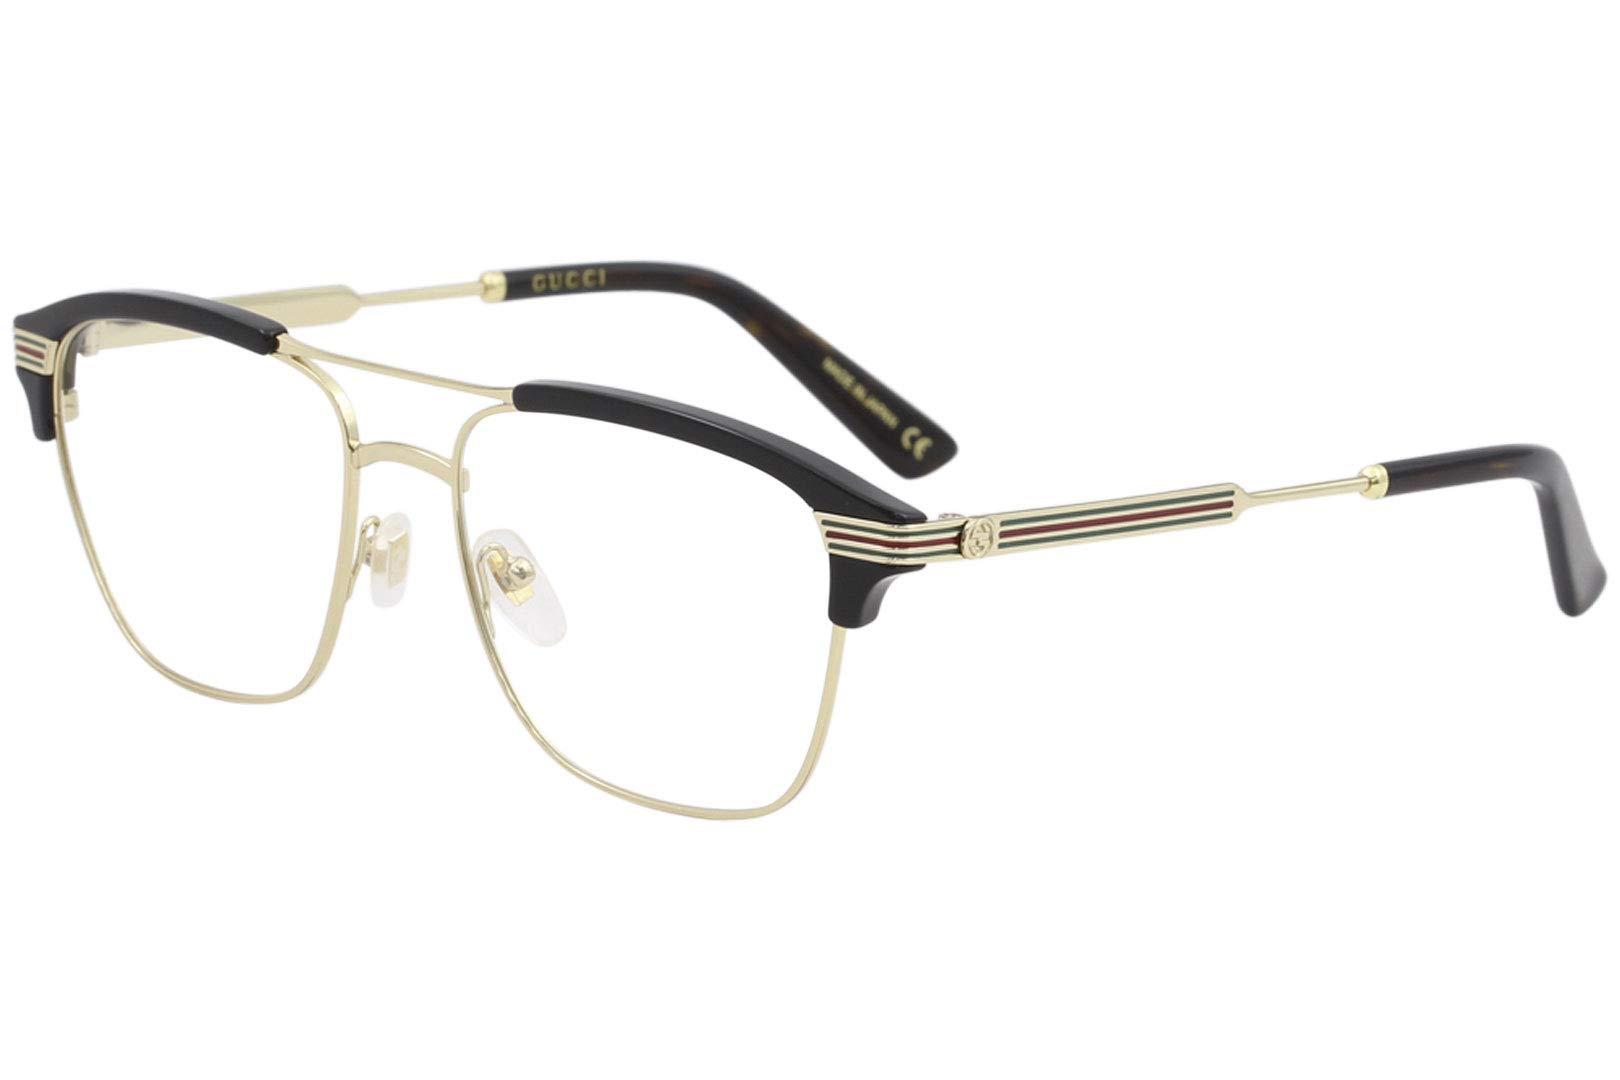 3909574e6a Gucci GG 0241O 002 Gold Black Plastic Rectangle Eyeglasses 54mm